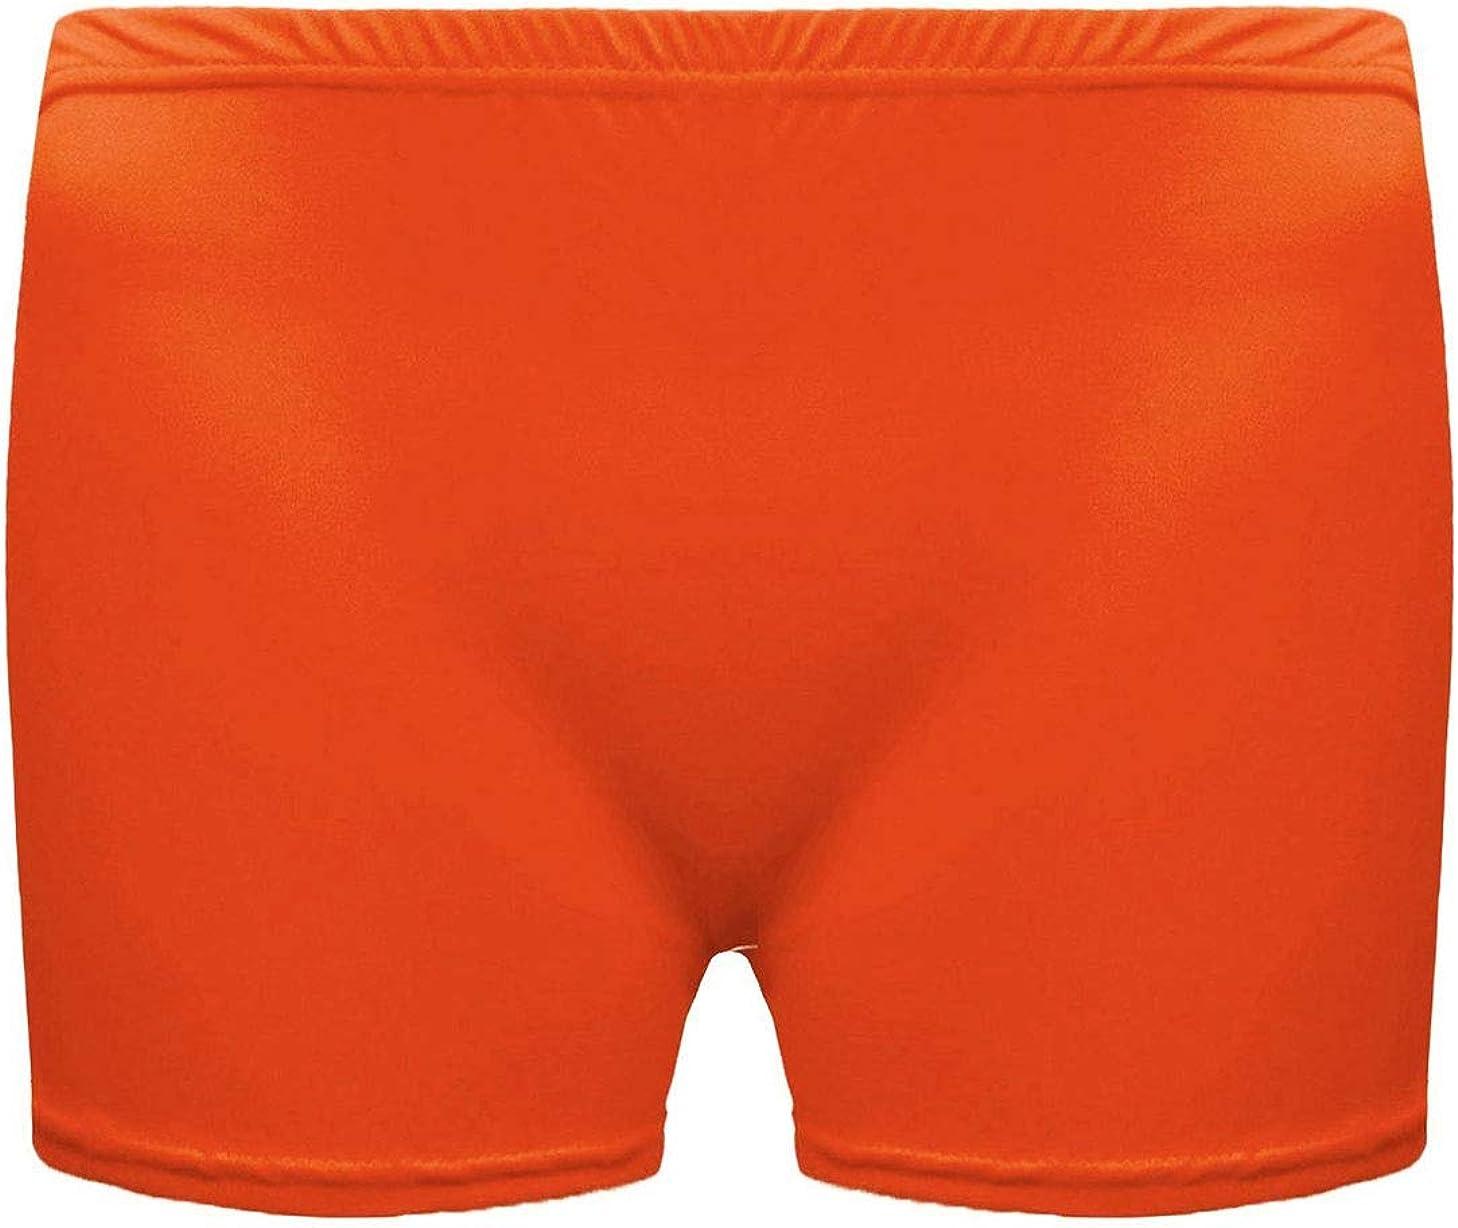 21Fashion Womens Ladies Gymnastics Gym Lycra Cotton Dance Shorts Childrens Girls Stretch Neon Hot Pants